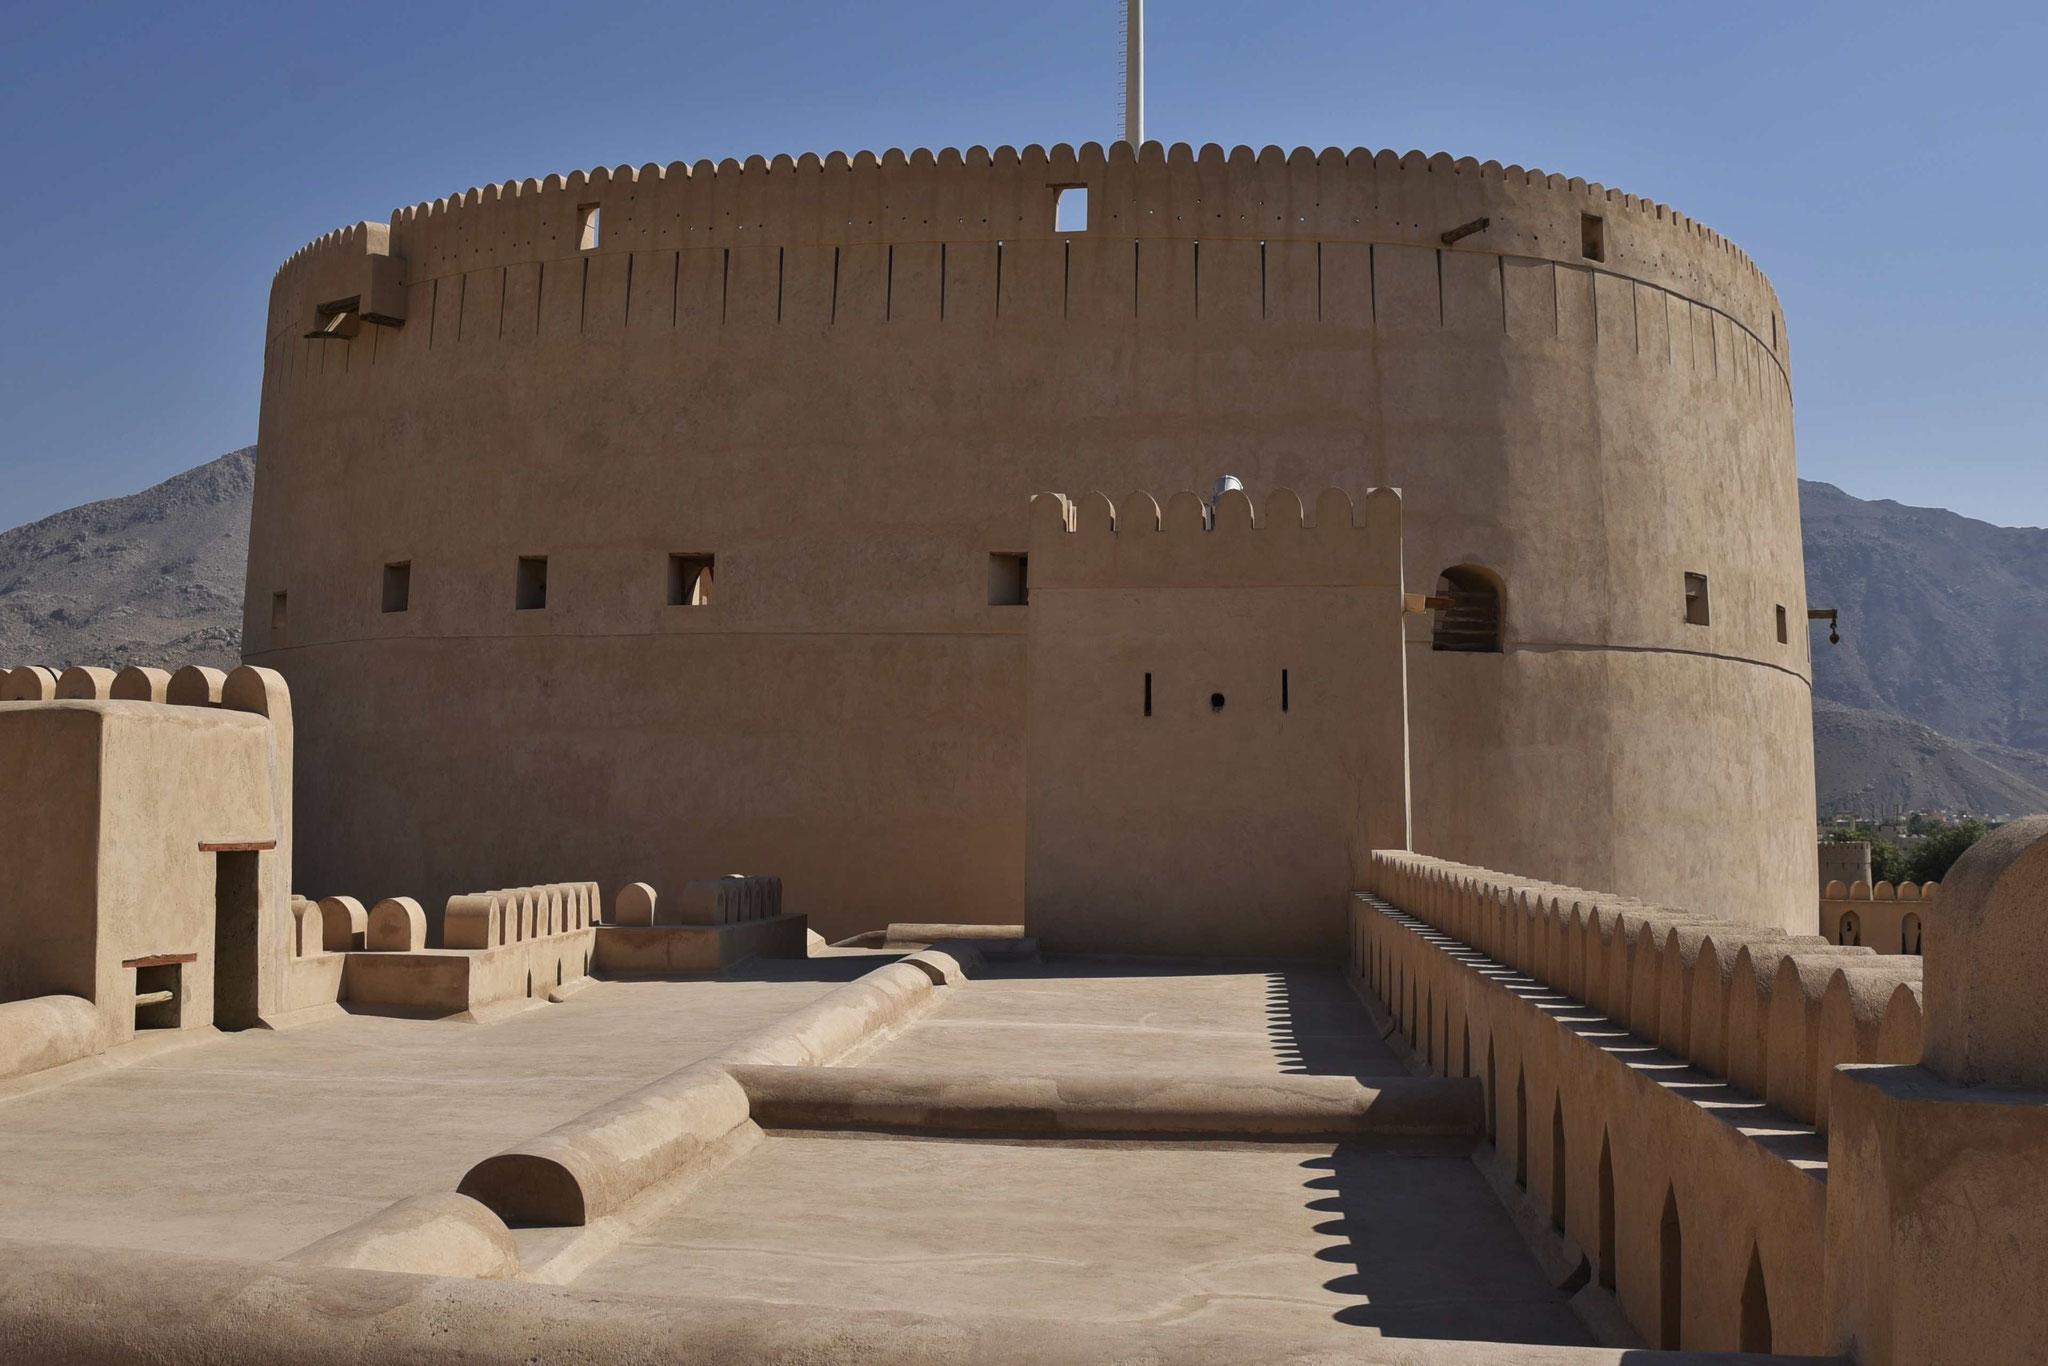 Auf dem Fort I